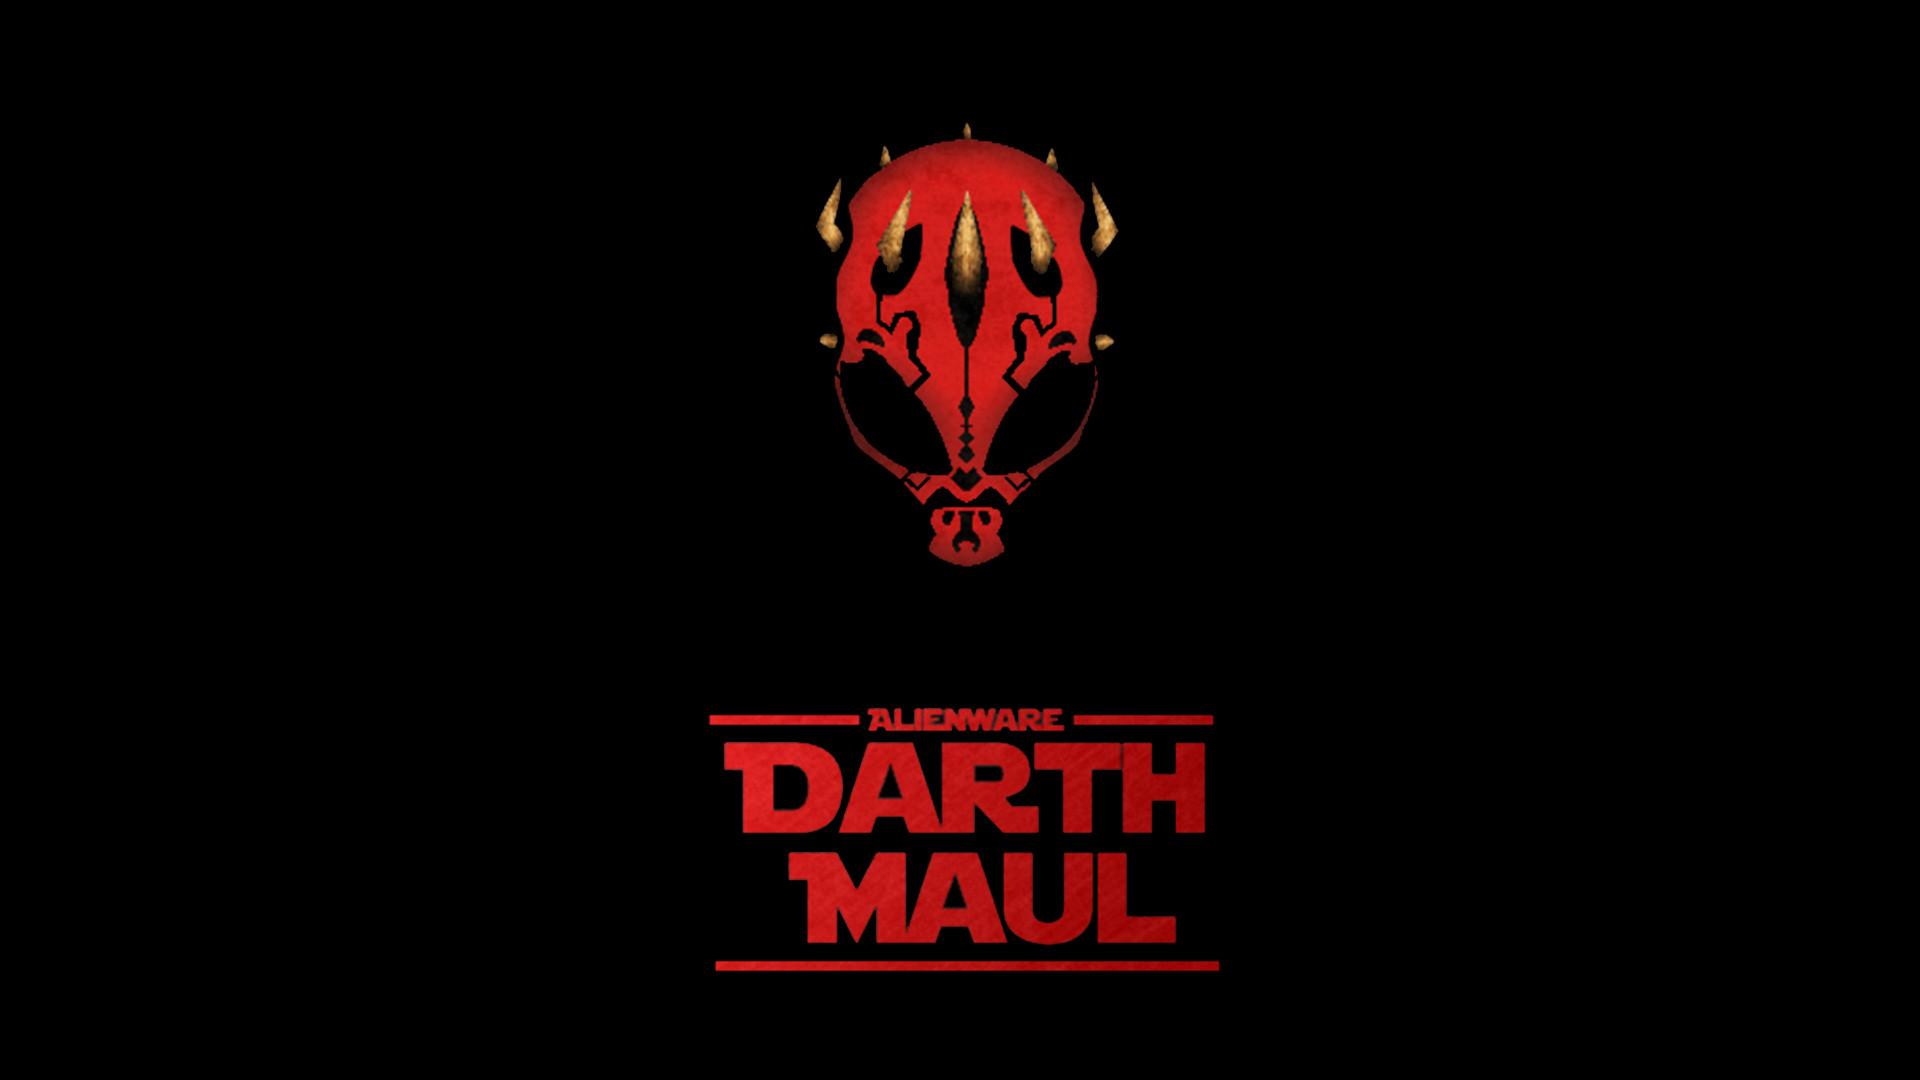 Darth Maul Wallpapers – Wallpaper Cave